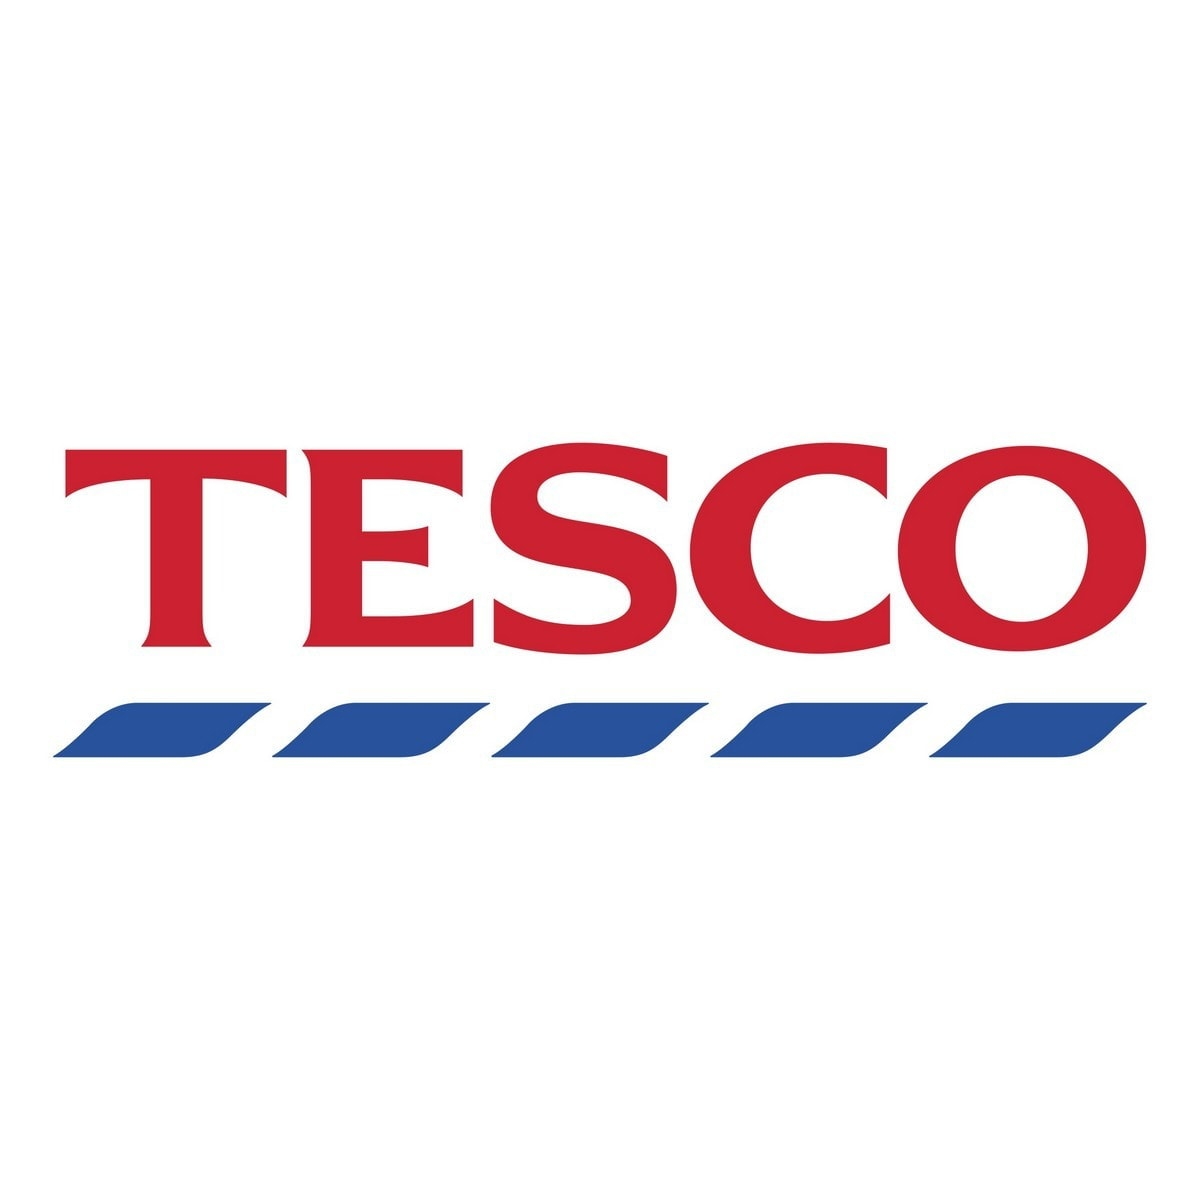 Marketing mix of Tesco - Tesco Service marketing mix and 7 P\'s